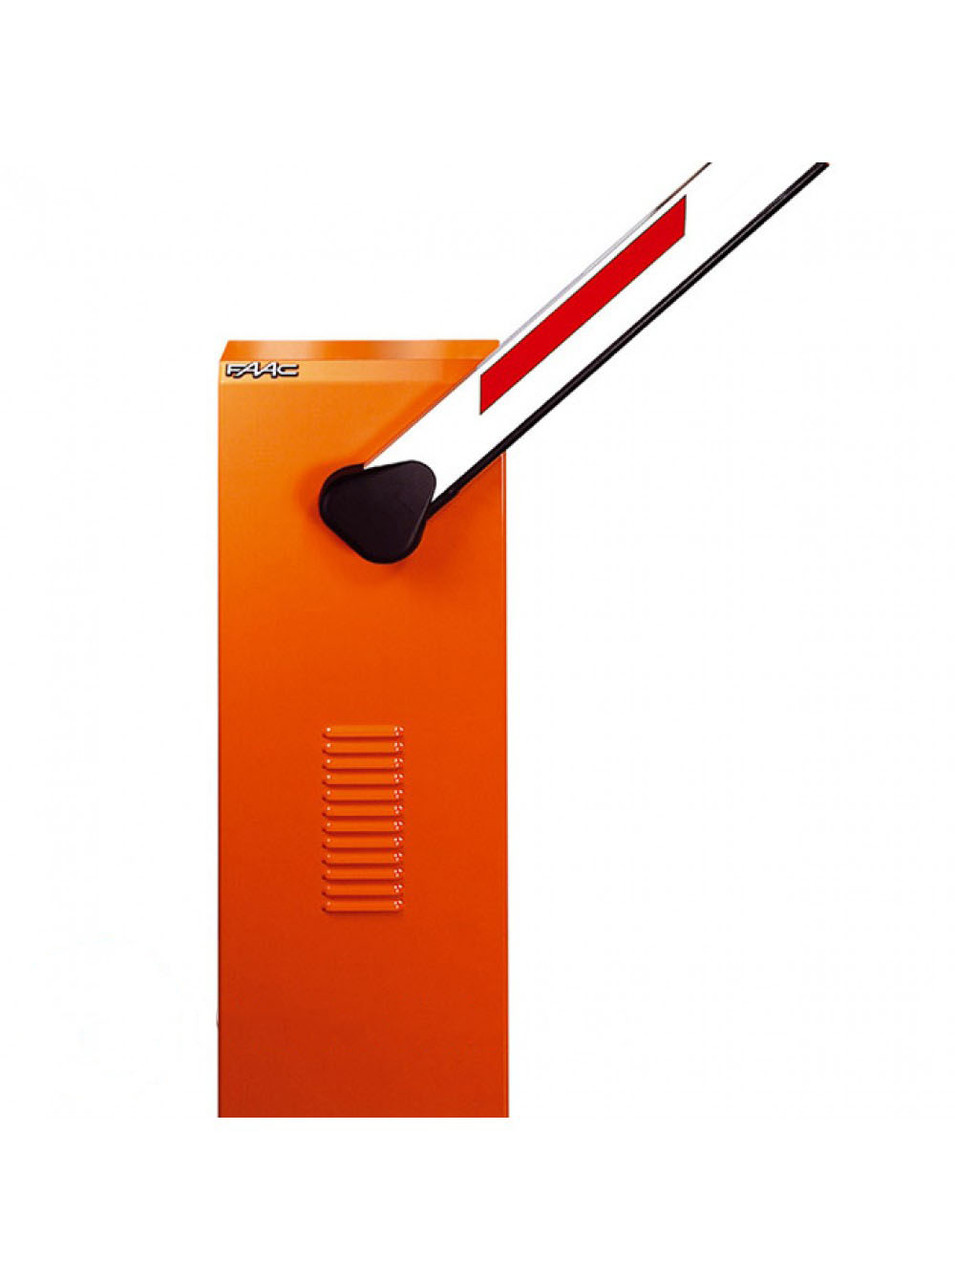 FAAC 620 Standard, стрела 2.815 м с изломом